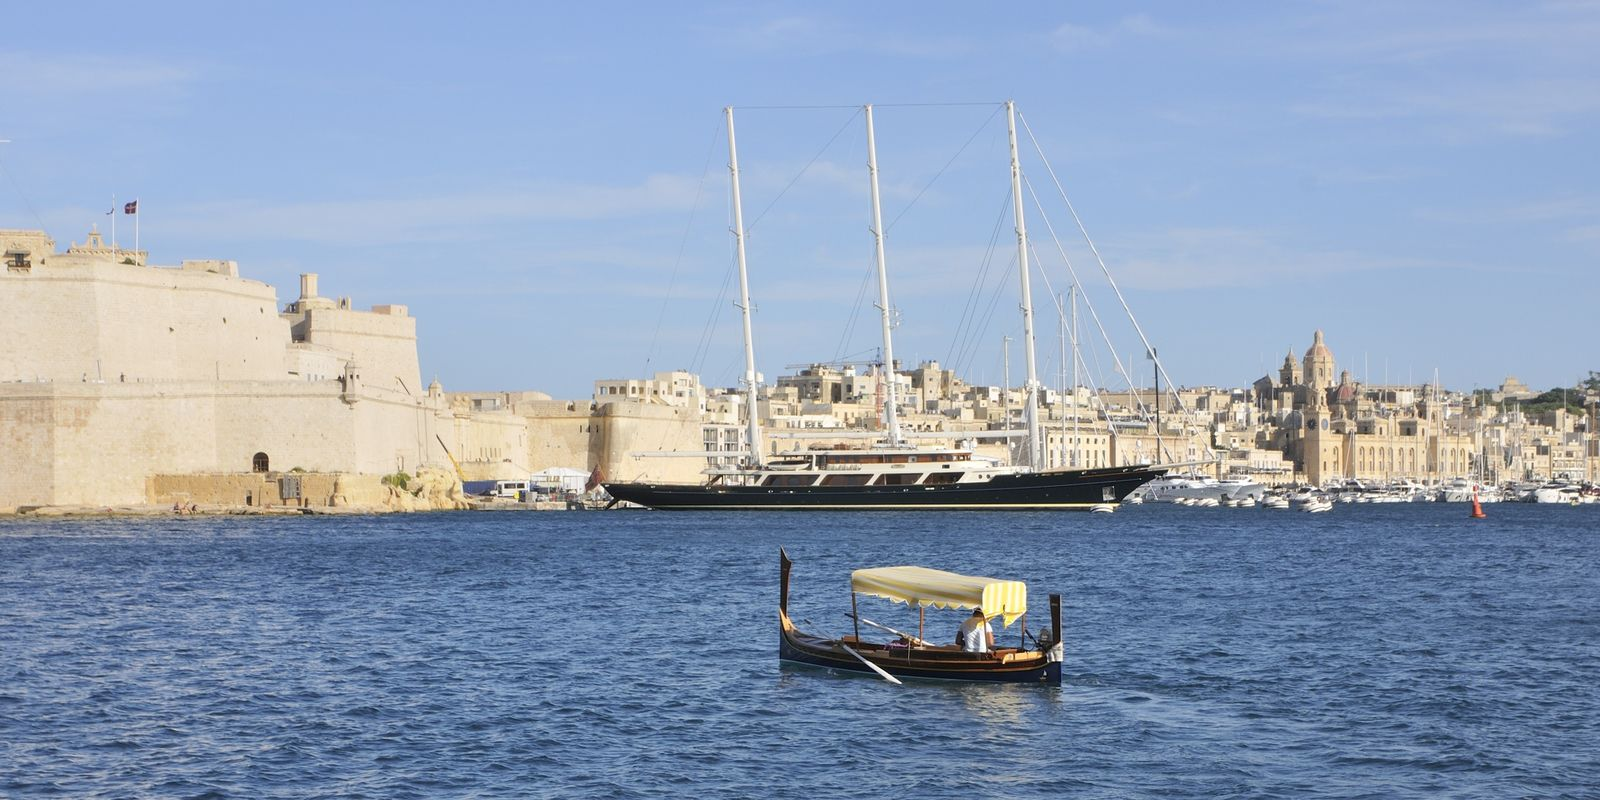 Malte, septembre 2019